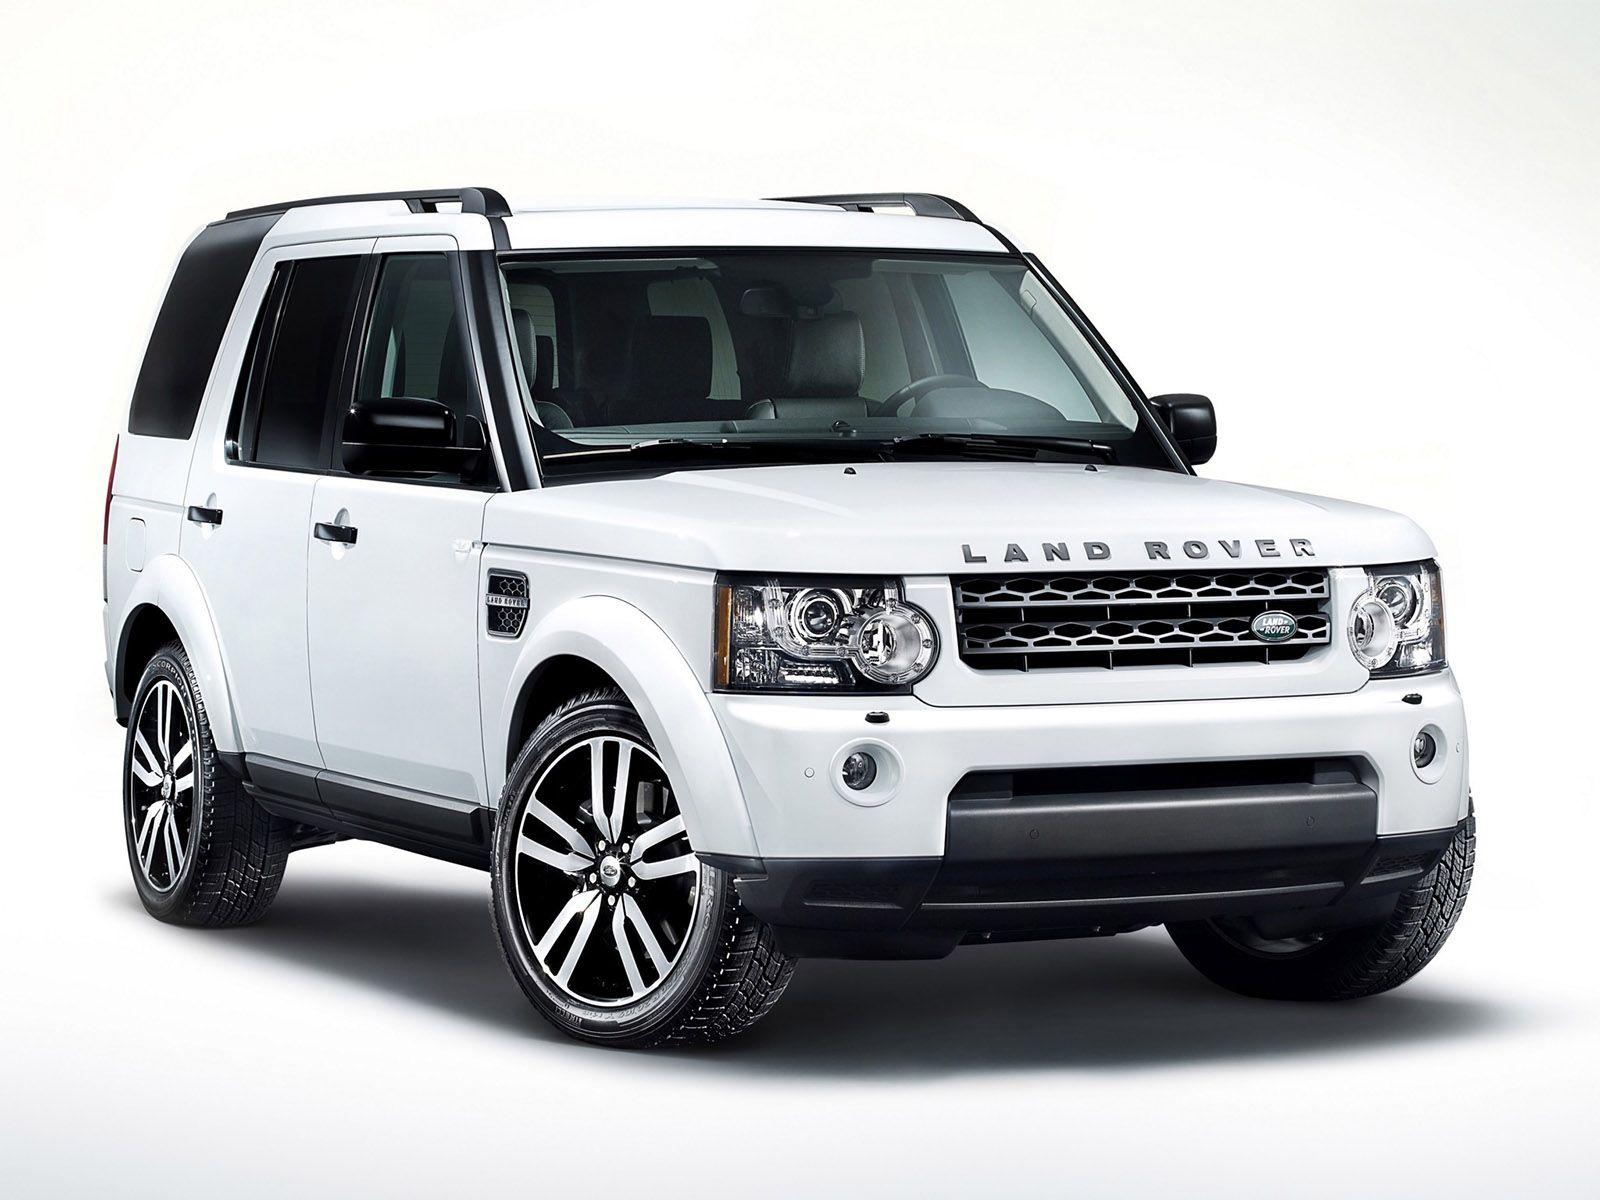 Land Rover Discovery 4 ランドローバー, 車